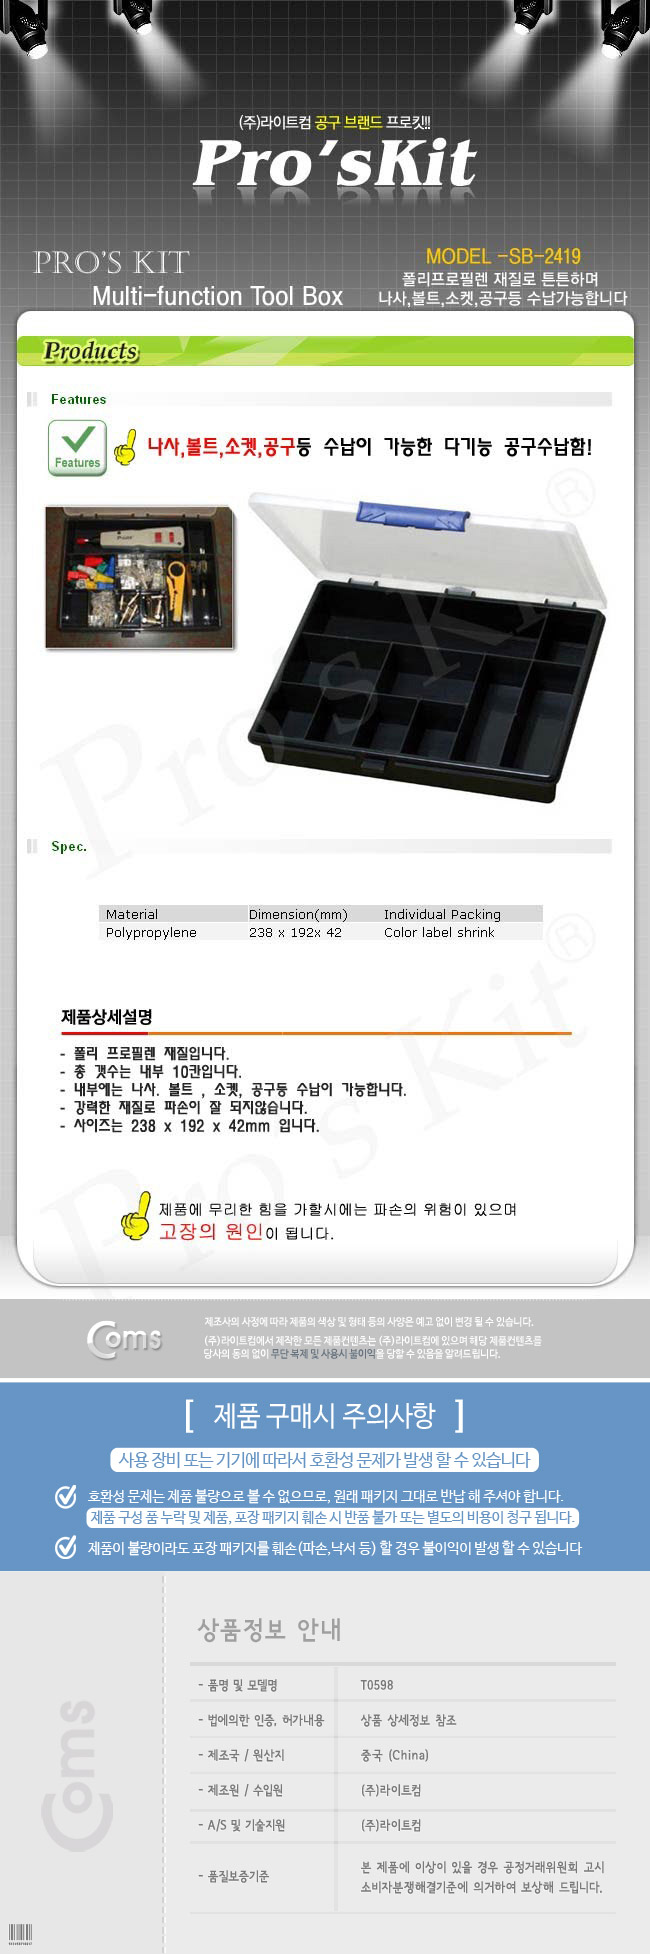 http://www.comsmart.co.kr/product/L0009440.jpg